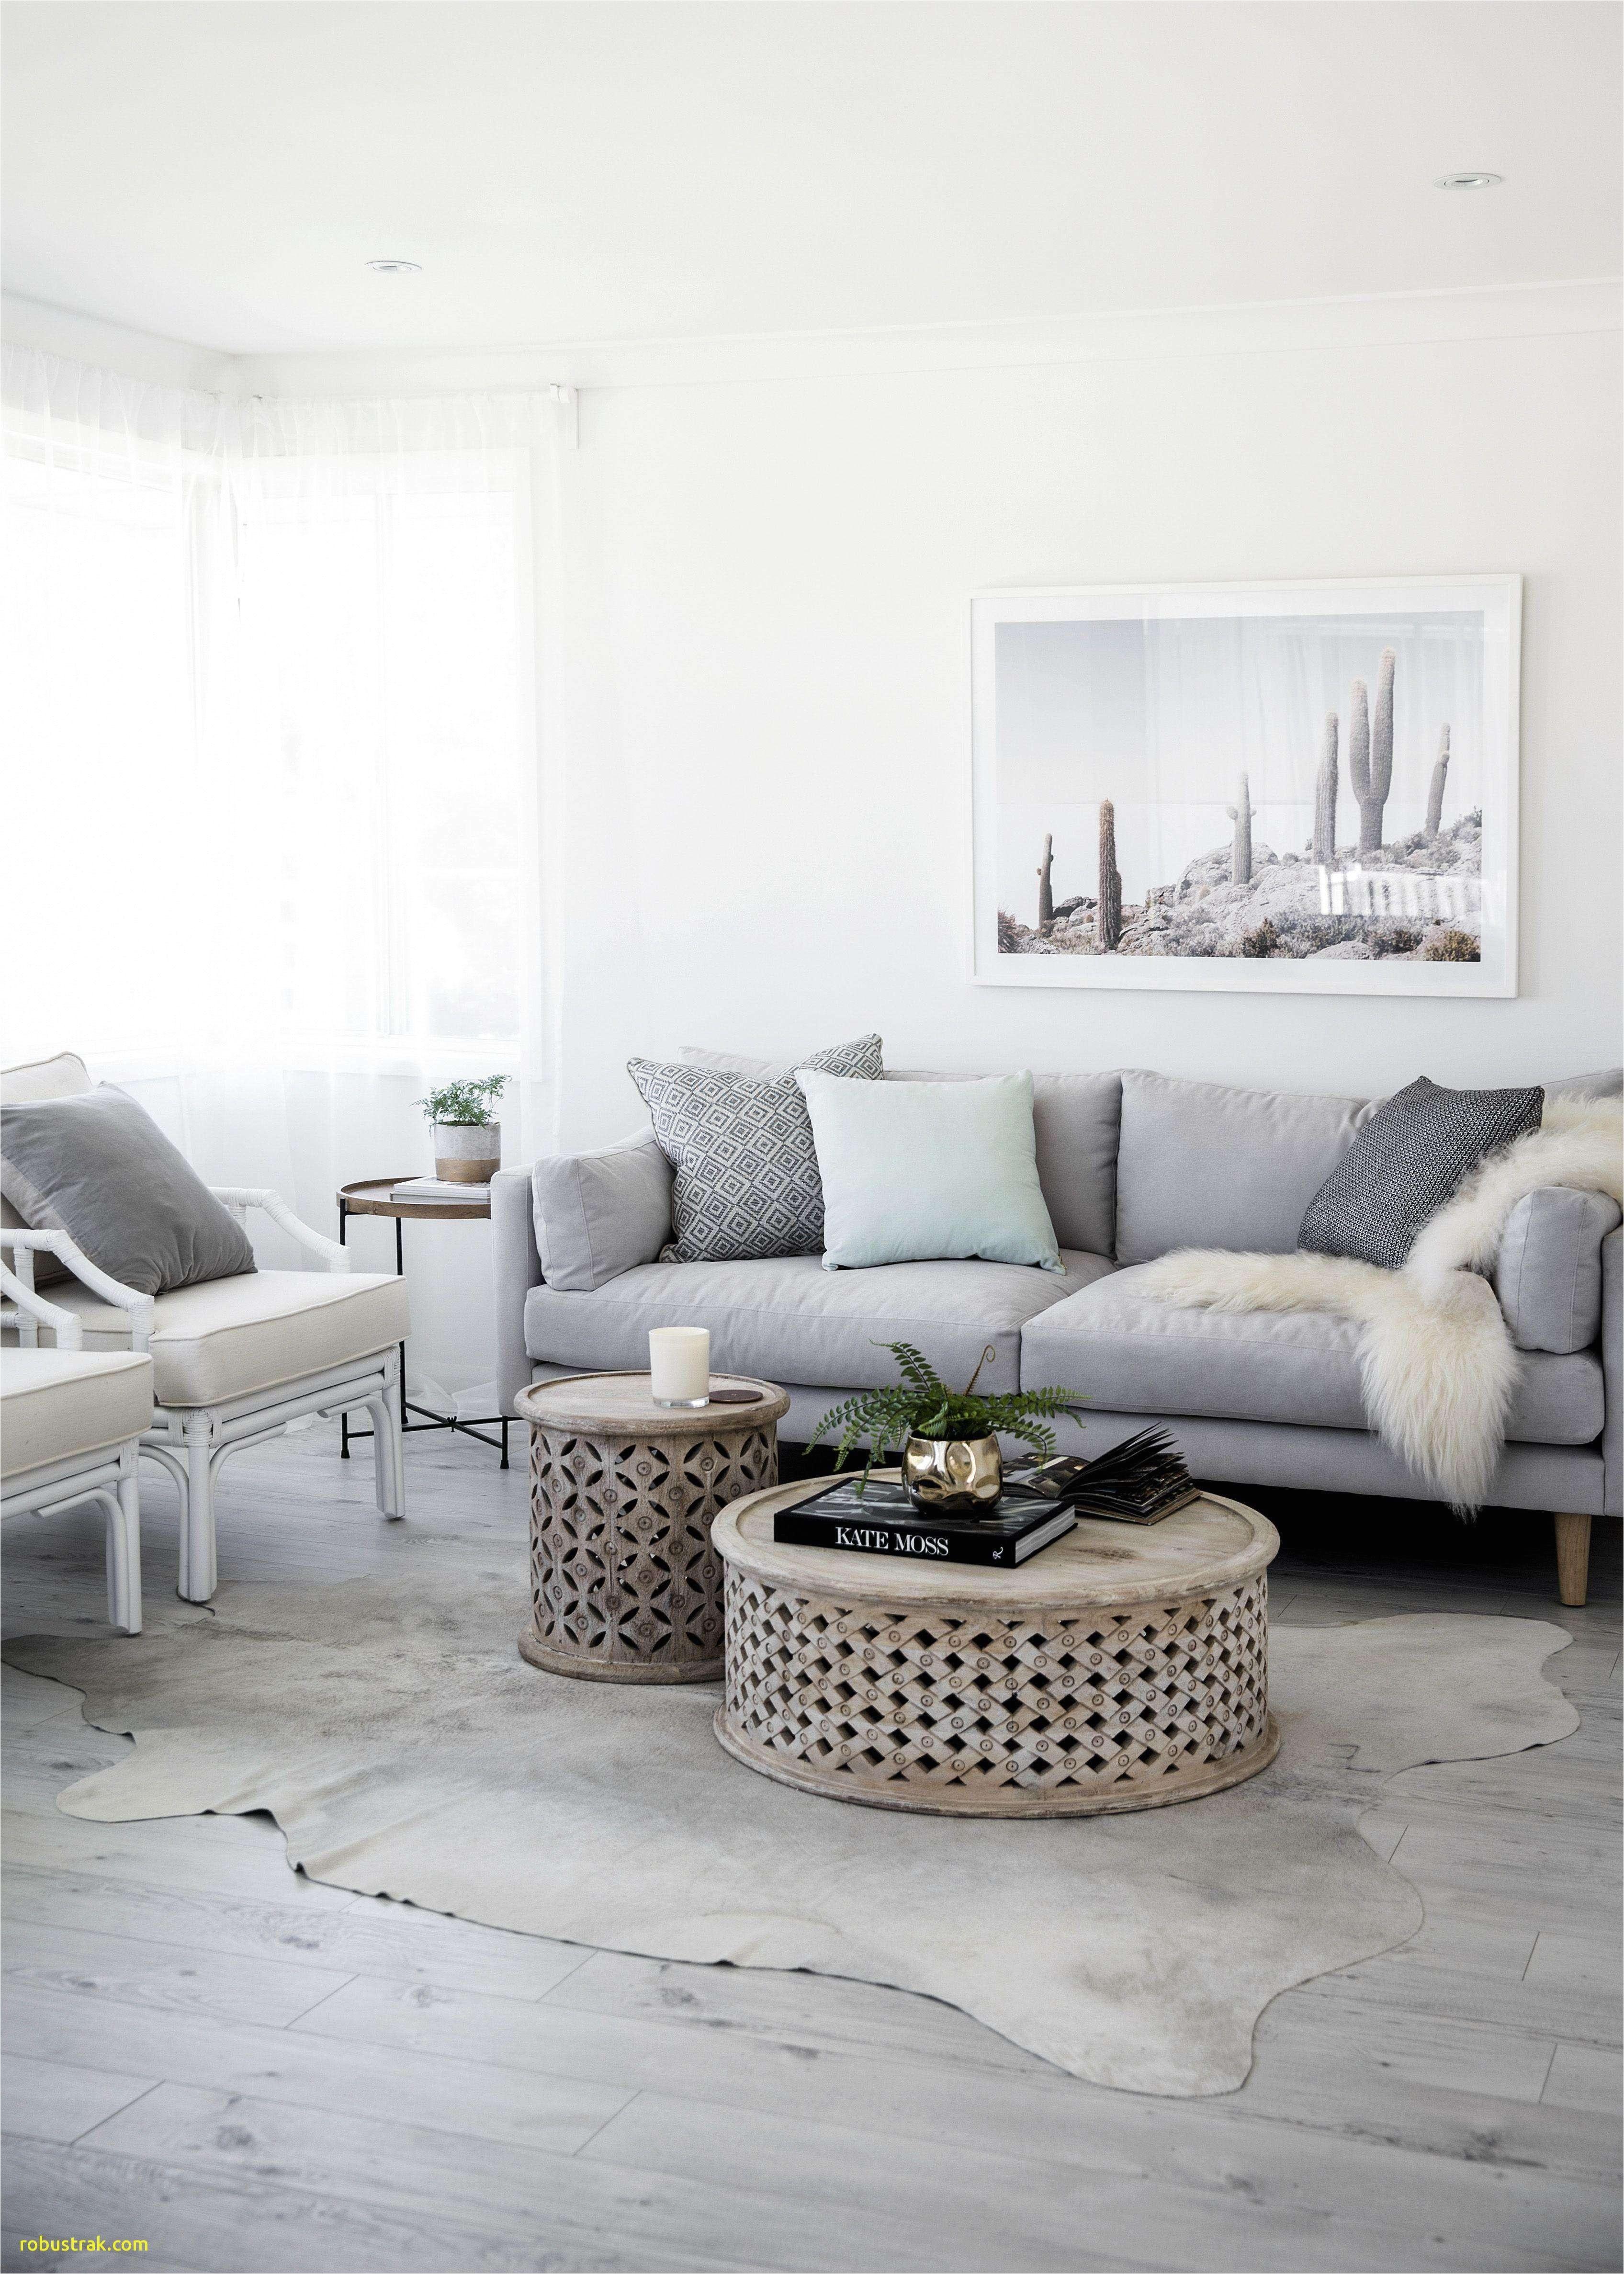 Small Living Room Furniture Ideas Beautiful How to Arrange Living Room Furniture